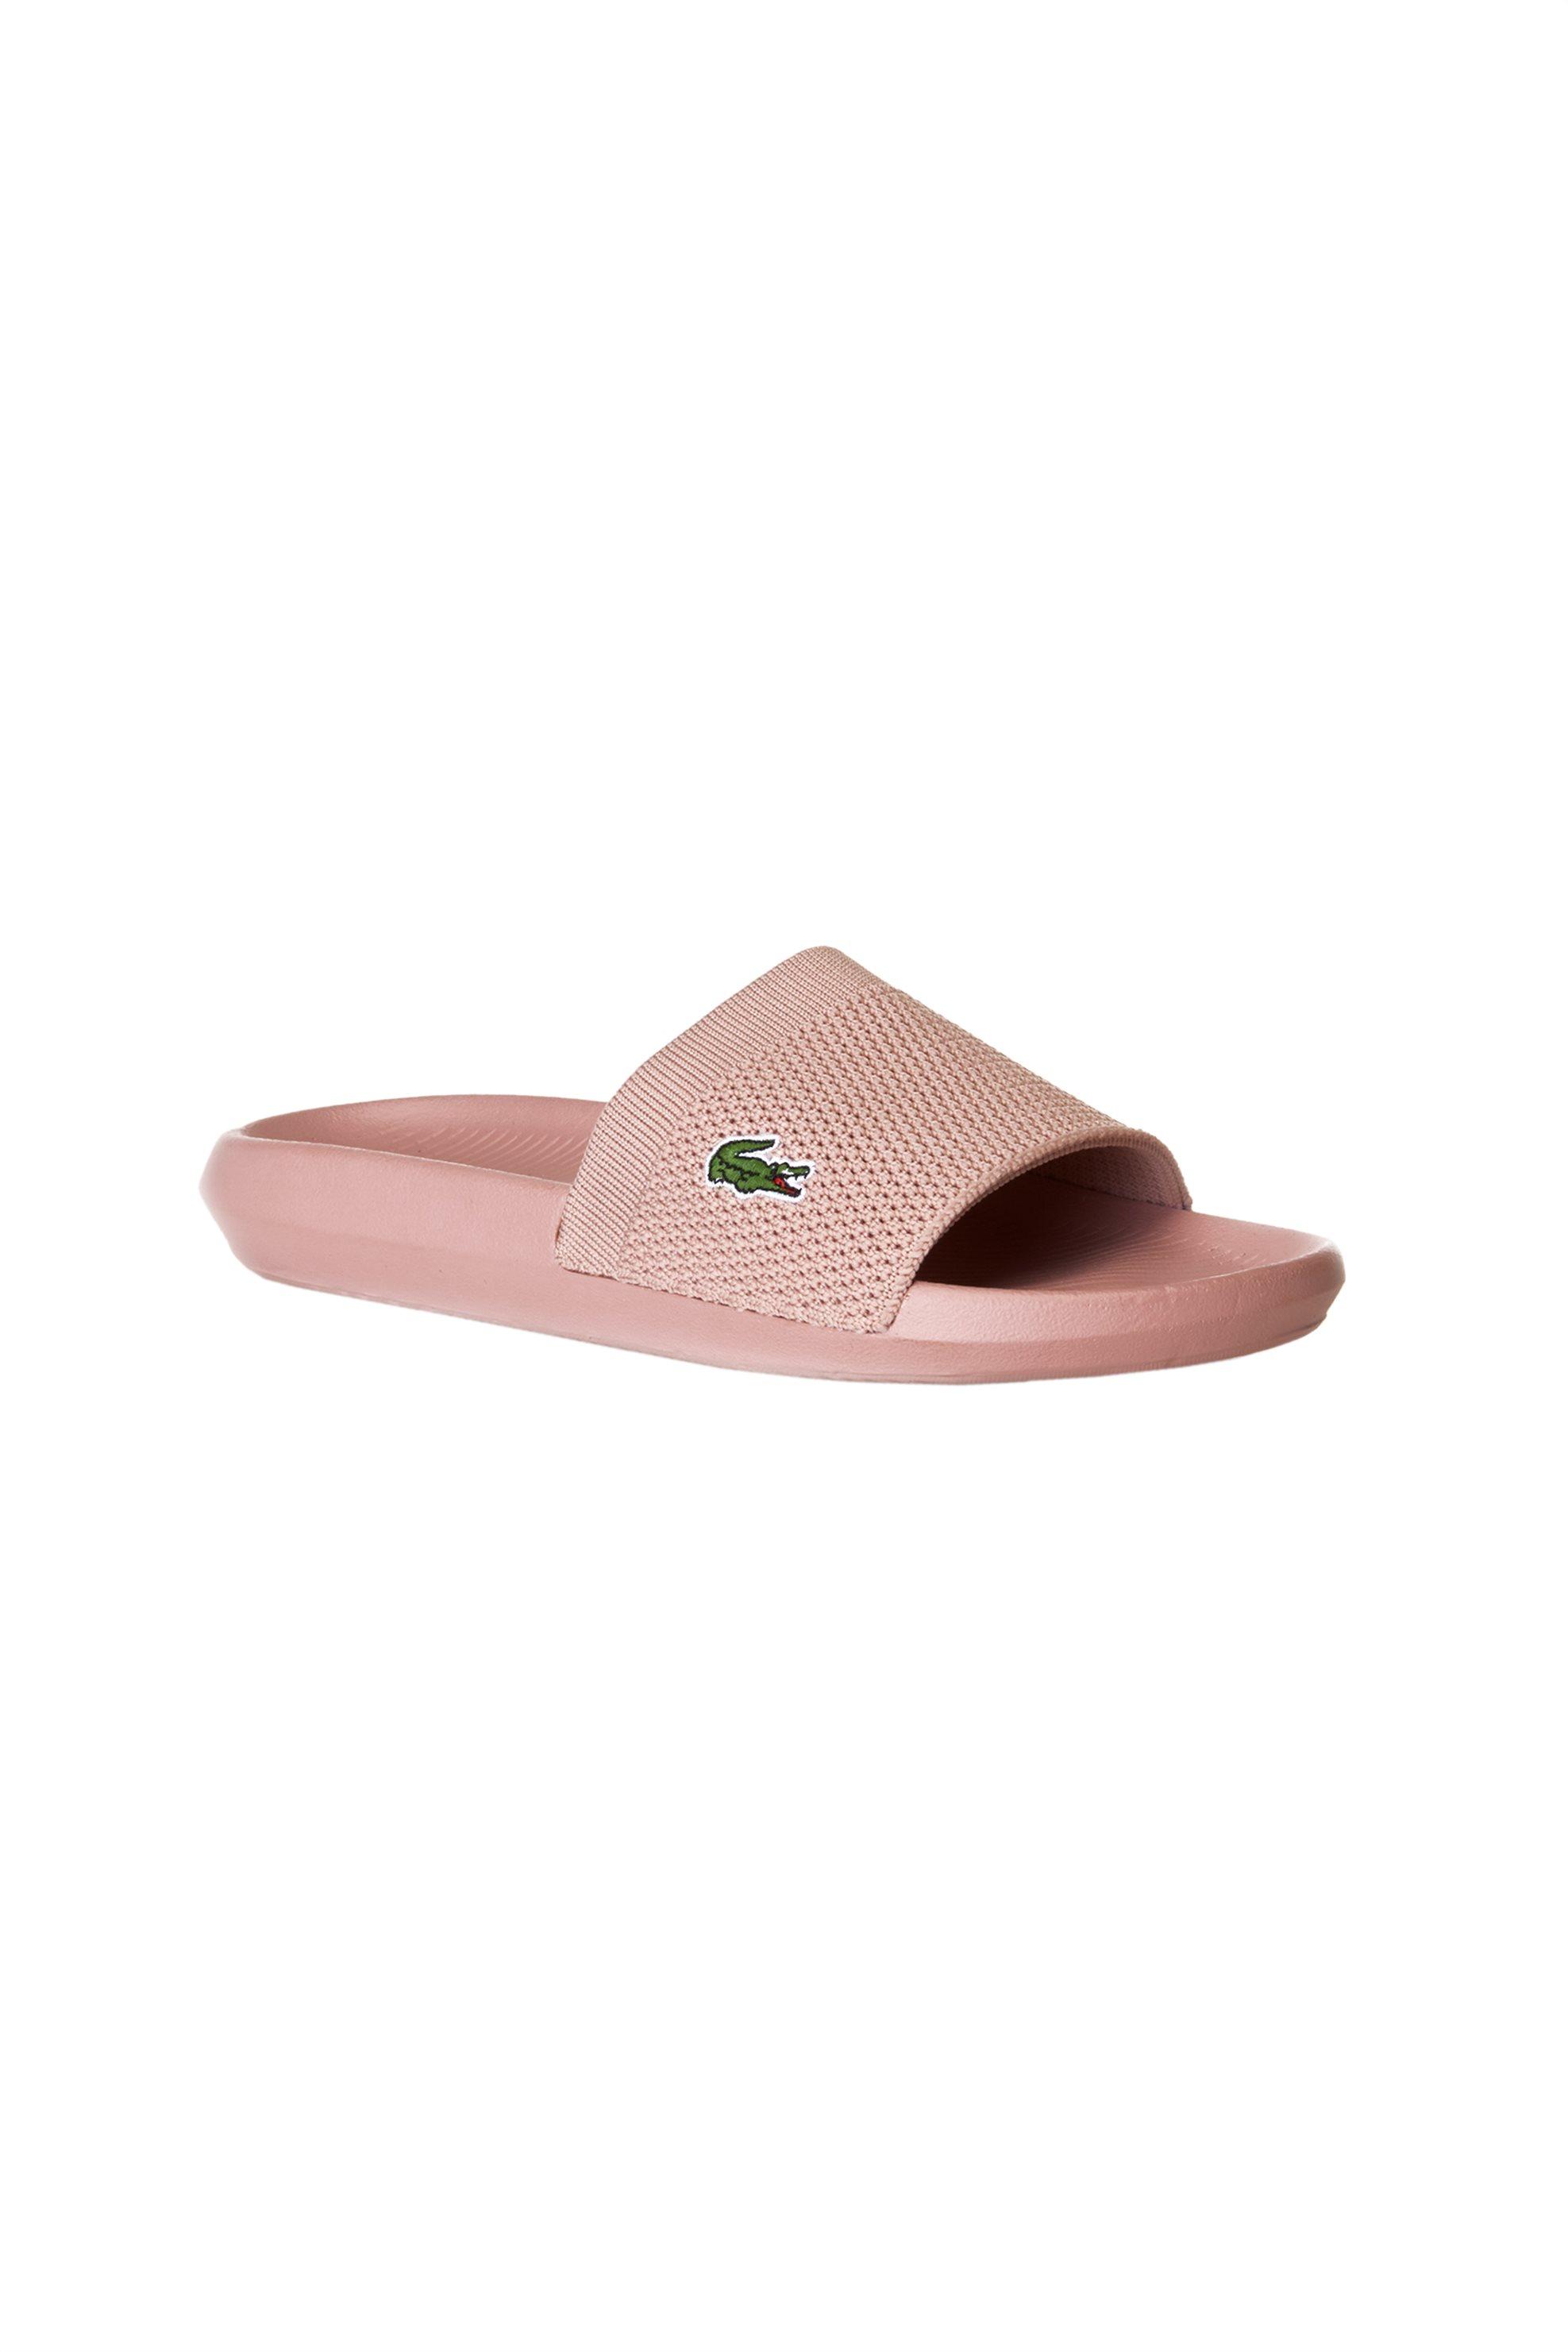 be74a04ebea Notos Lacoste γυναικείες παντόφλες Croco Slide – 37CFA0004NN1 – Ροζ